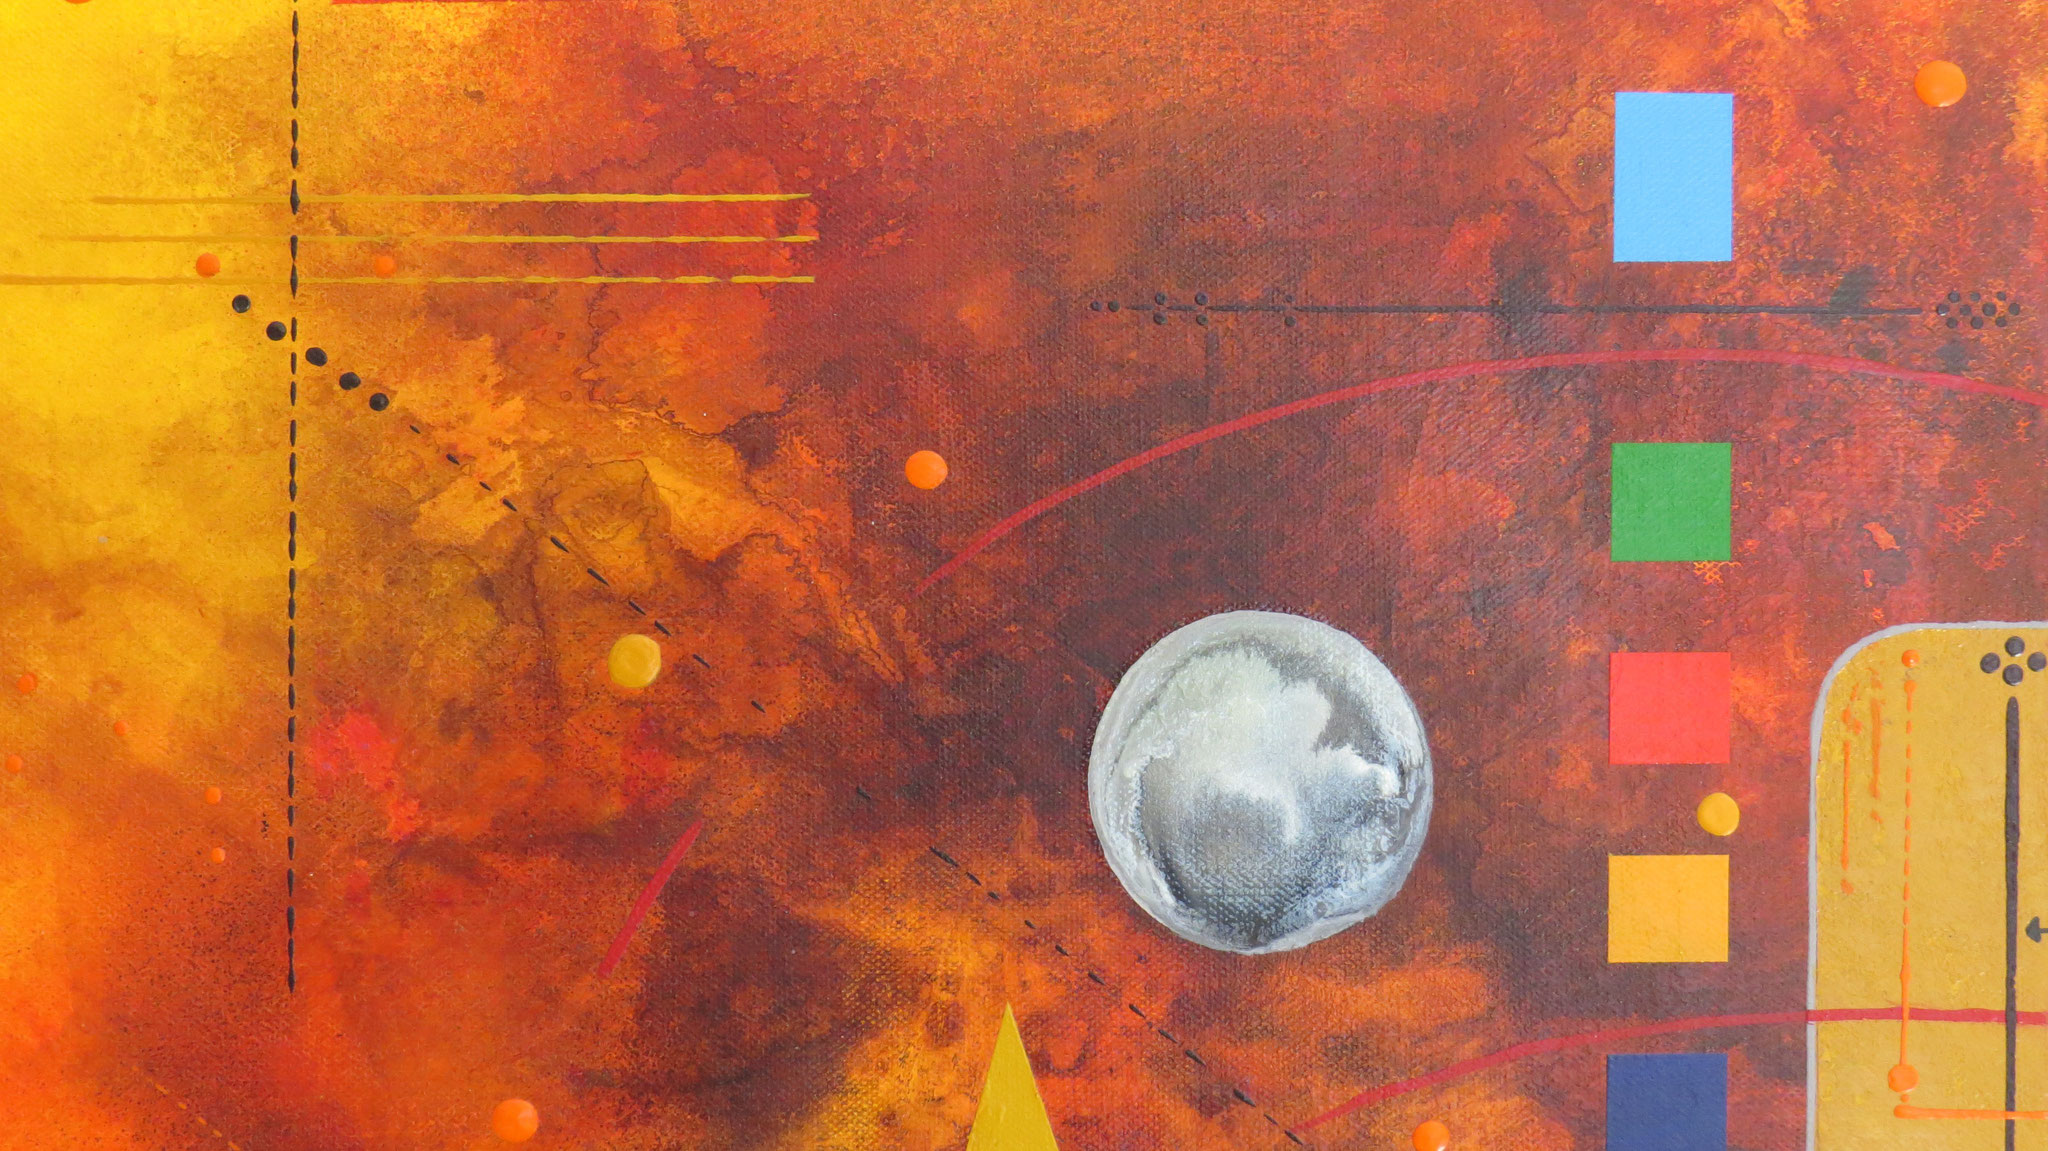 delta - zoom1 - DALUZ GALEGO - peinture abstraite